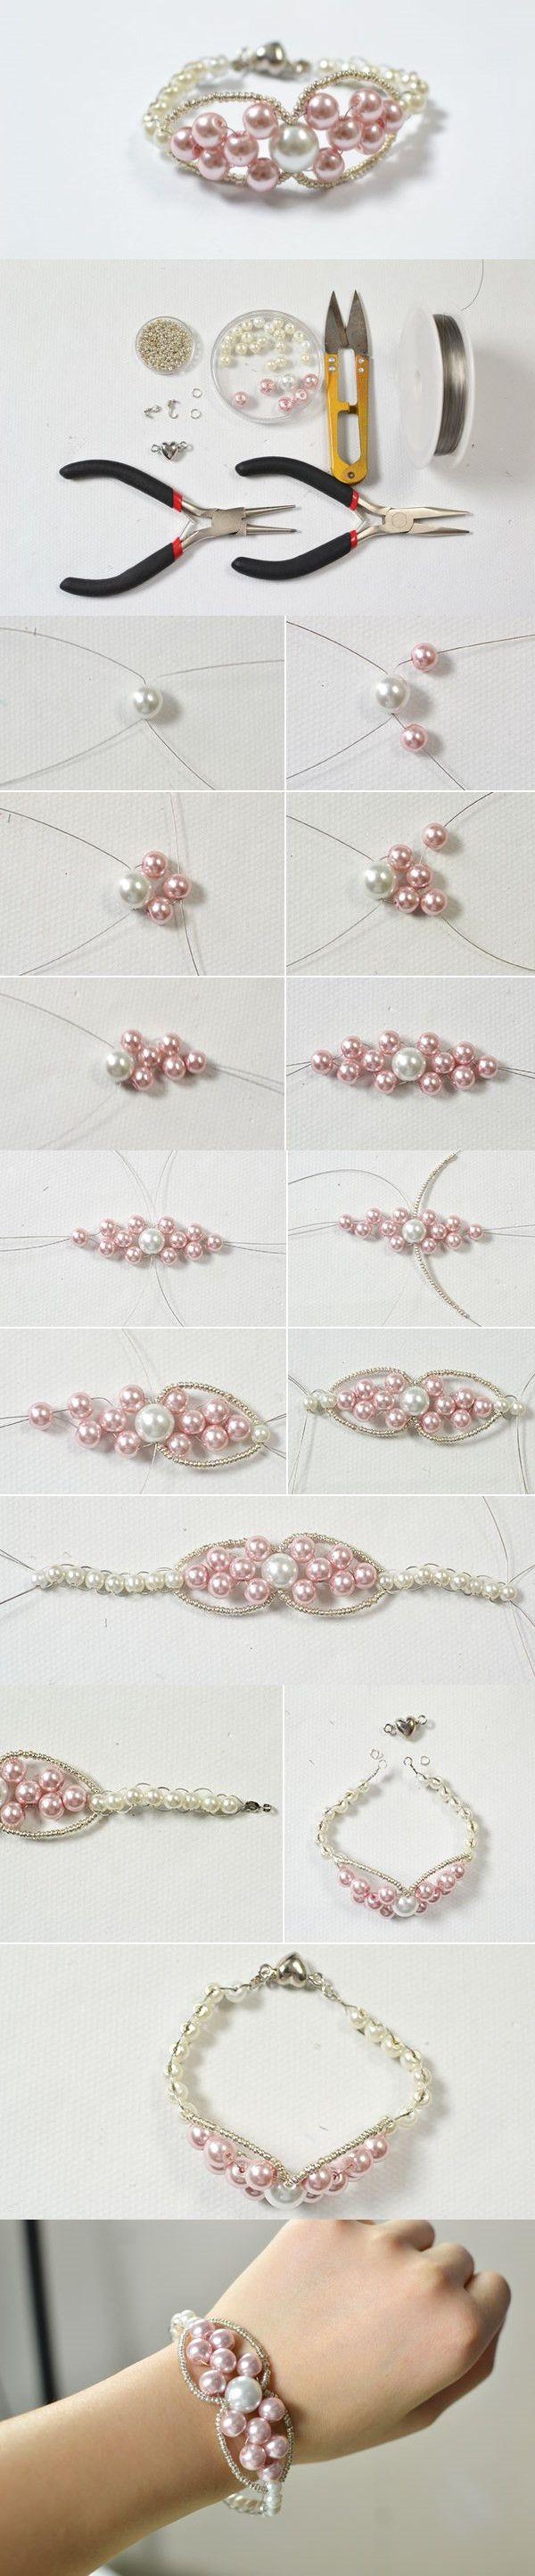 Making Chic and Elegant Pearl Beaded Bracelet